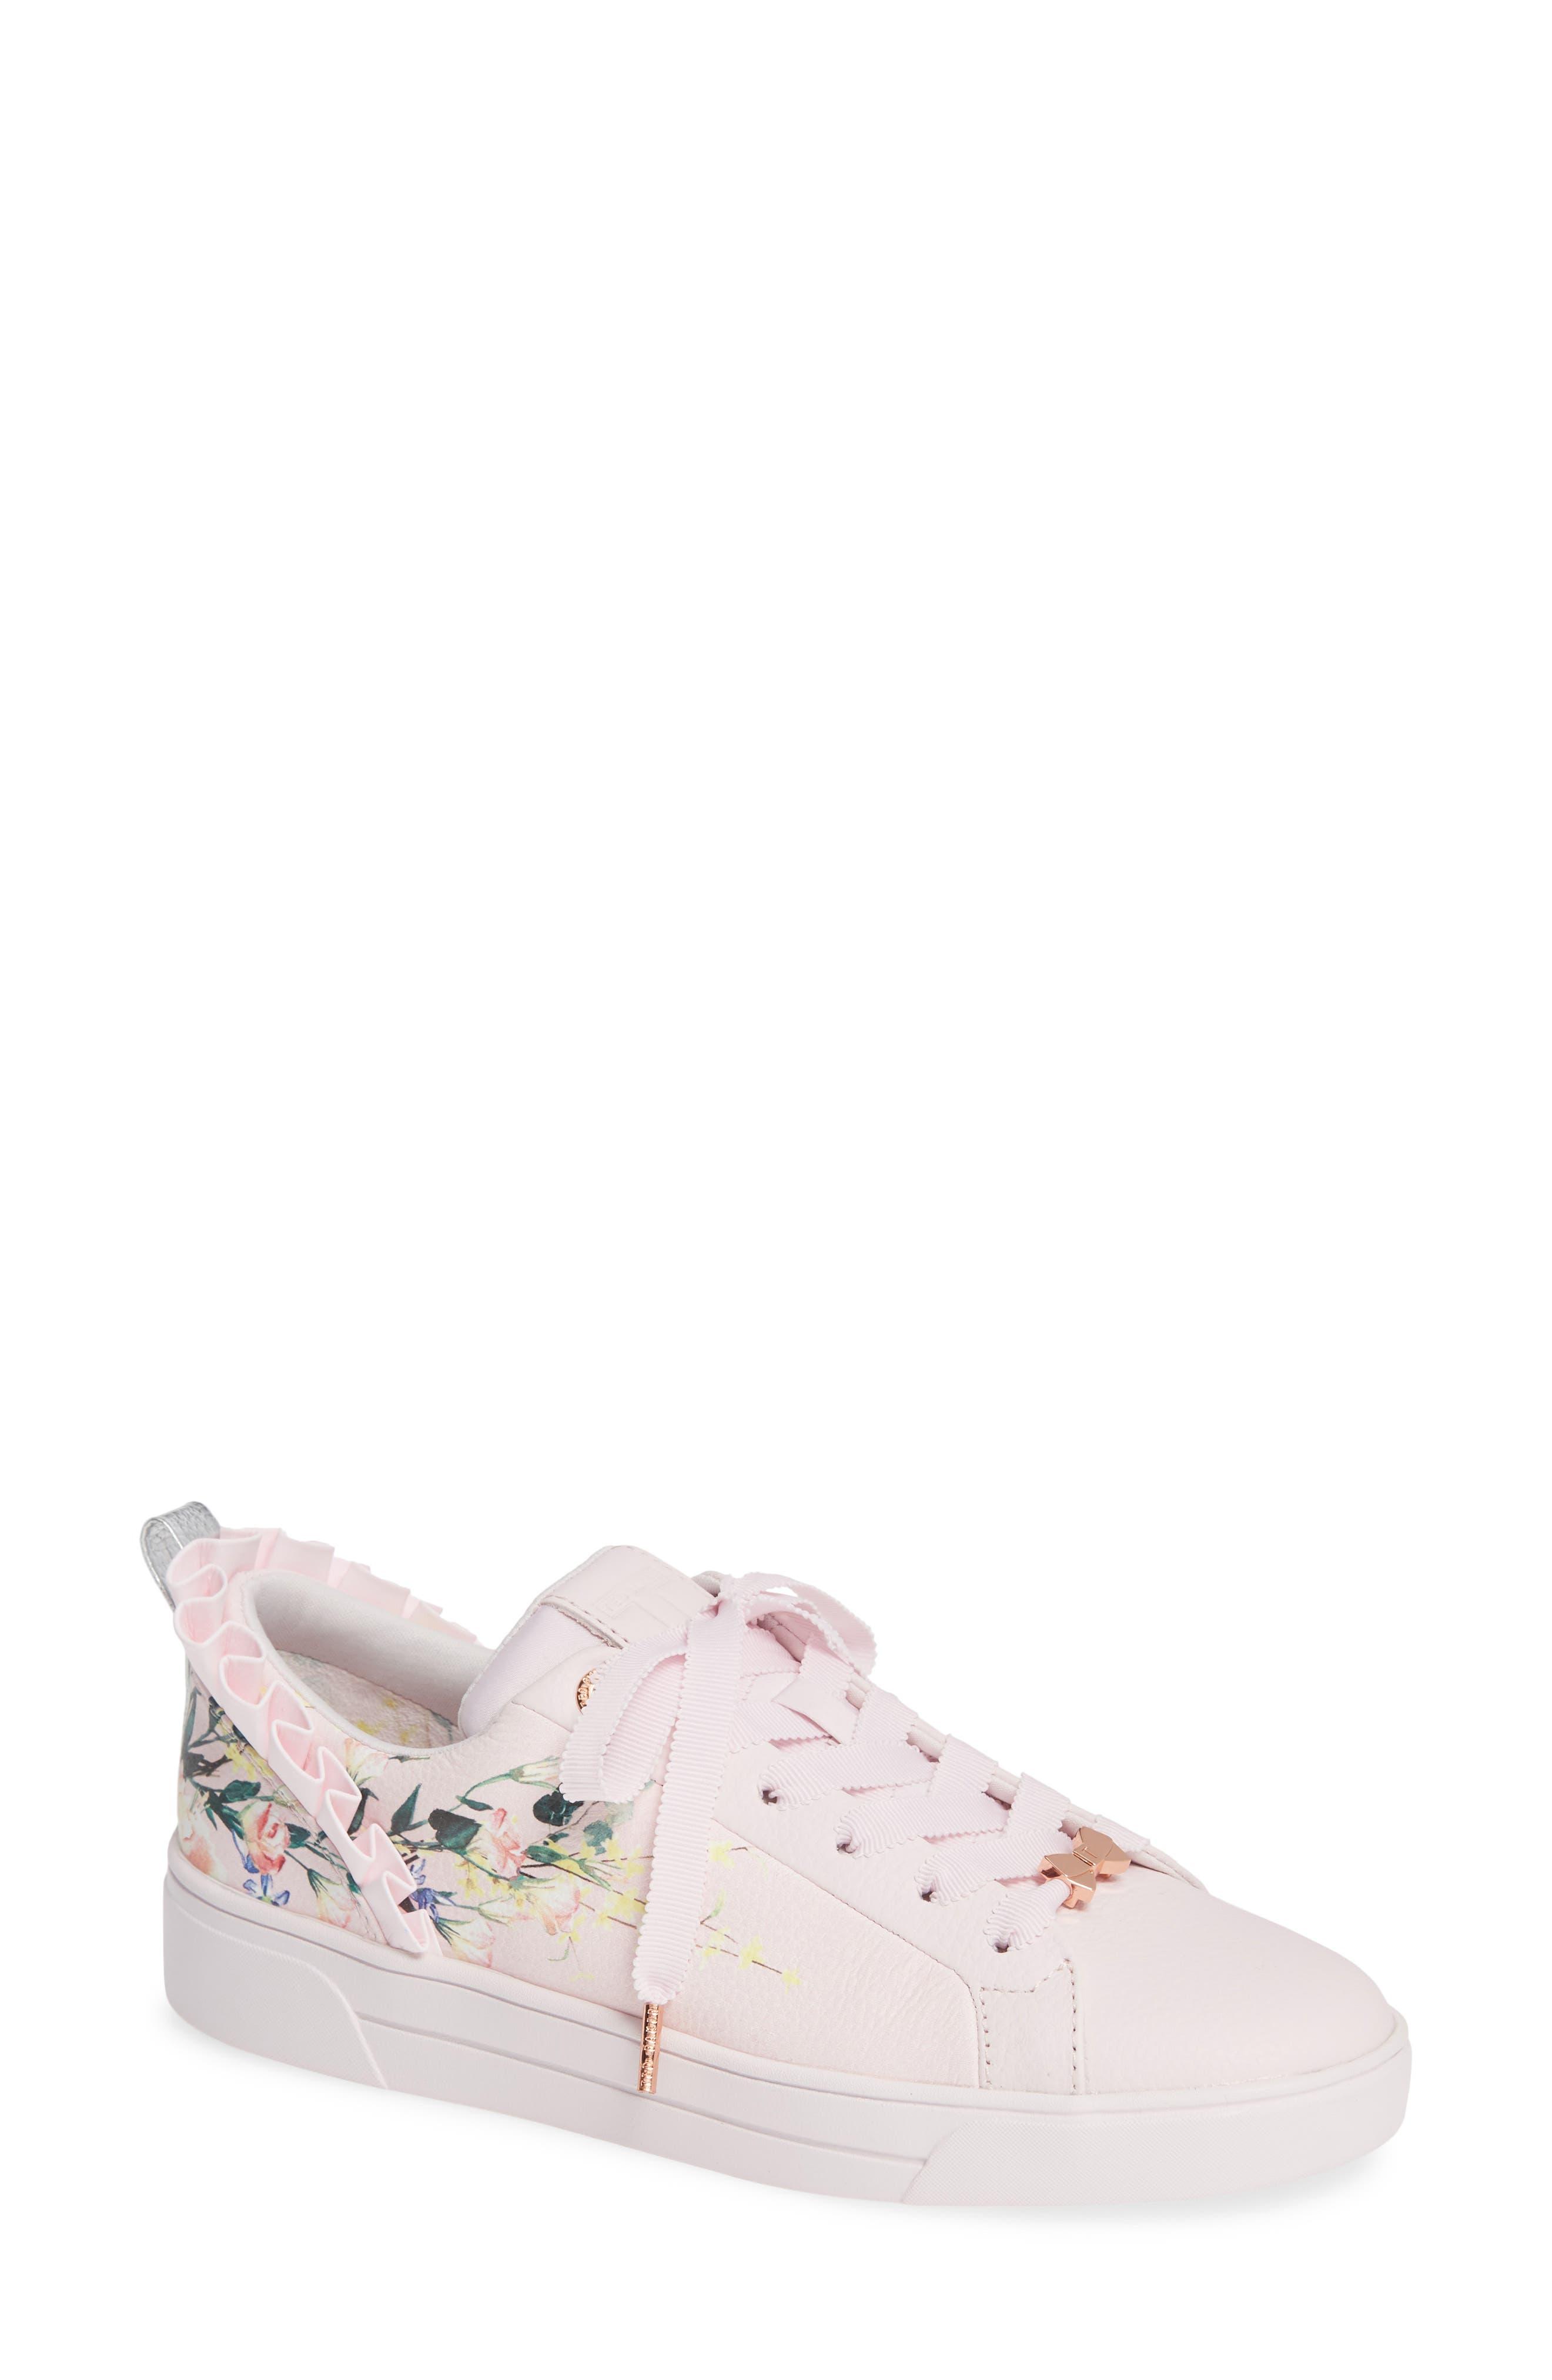 TED BAKER LONDON Astrina Sneaker, Main, color, ELEGANT PINK LEATHER